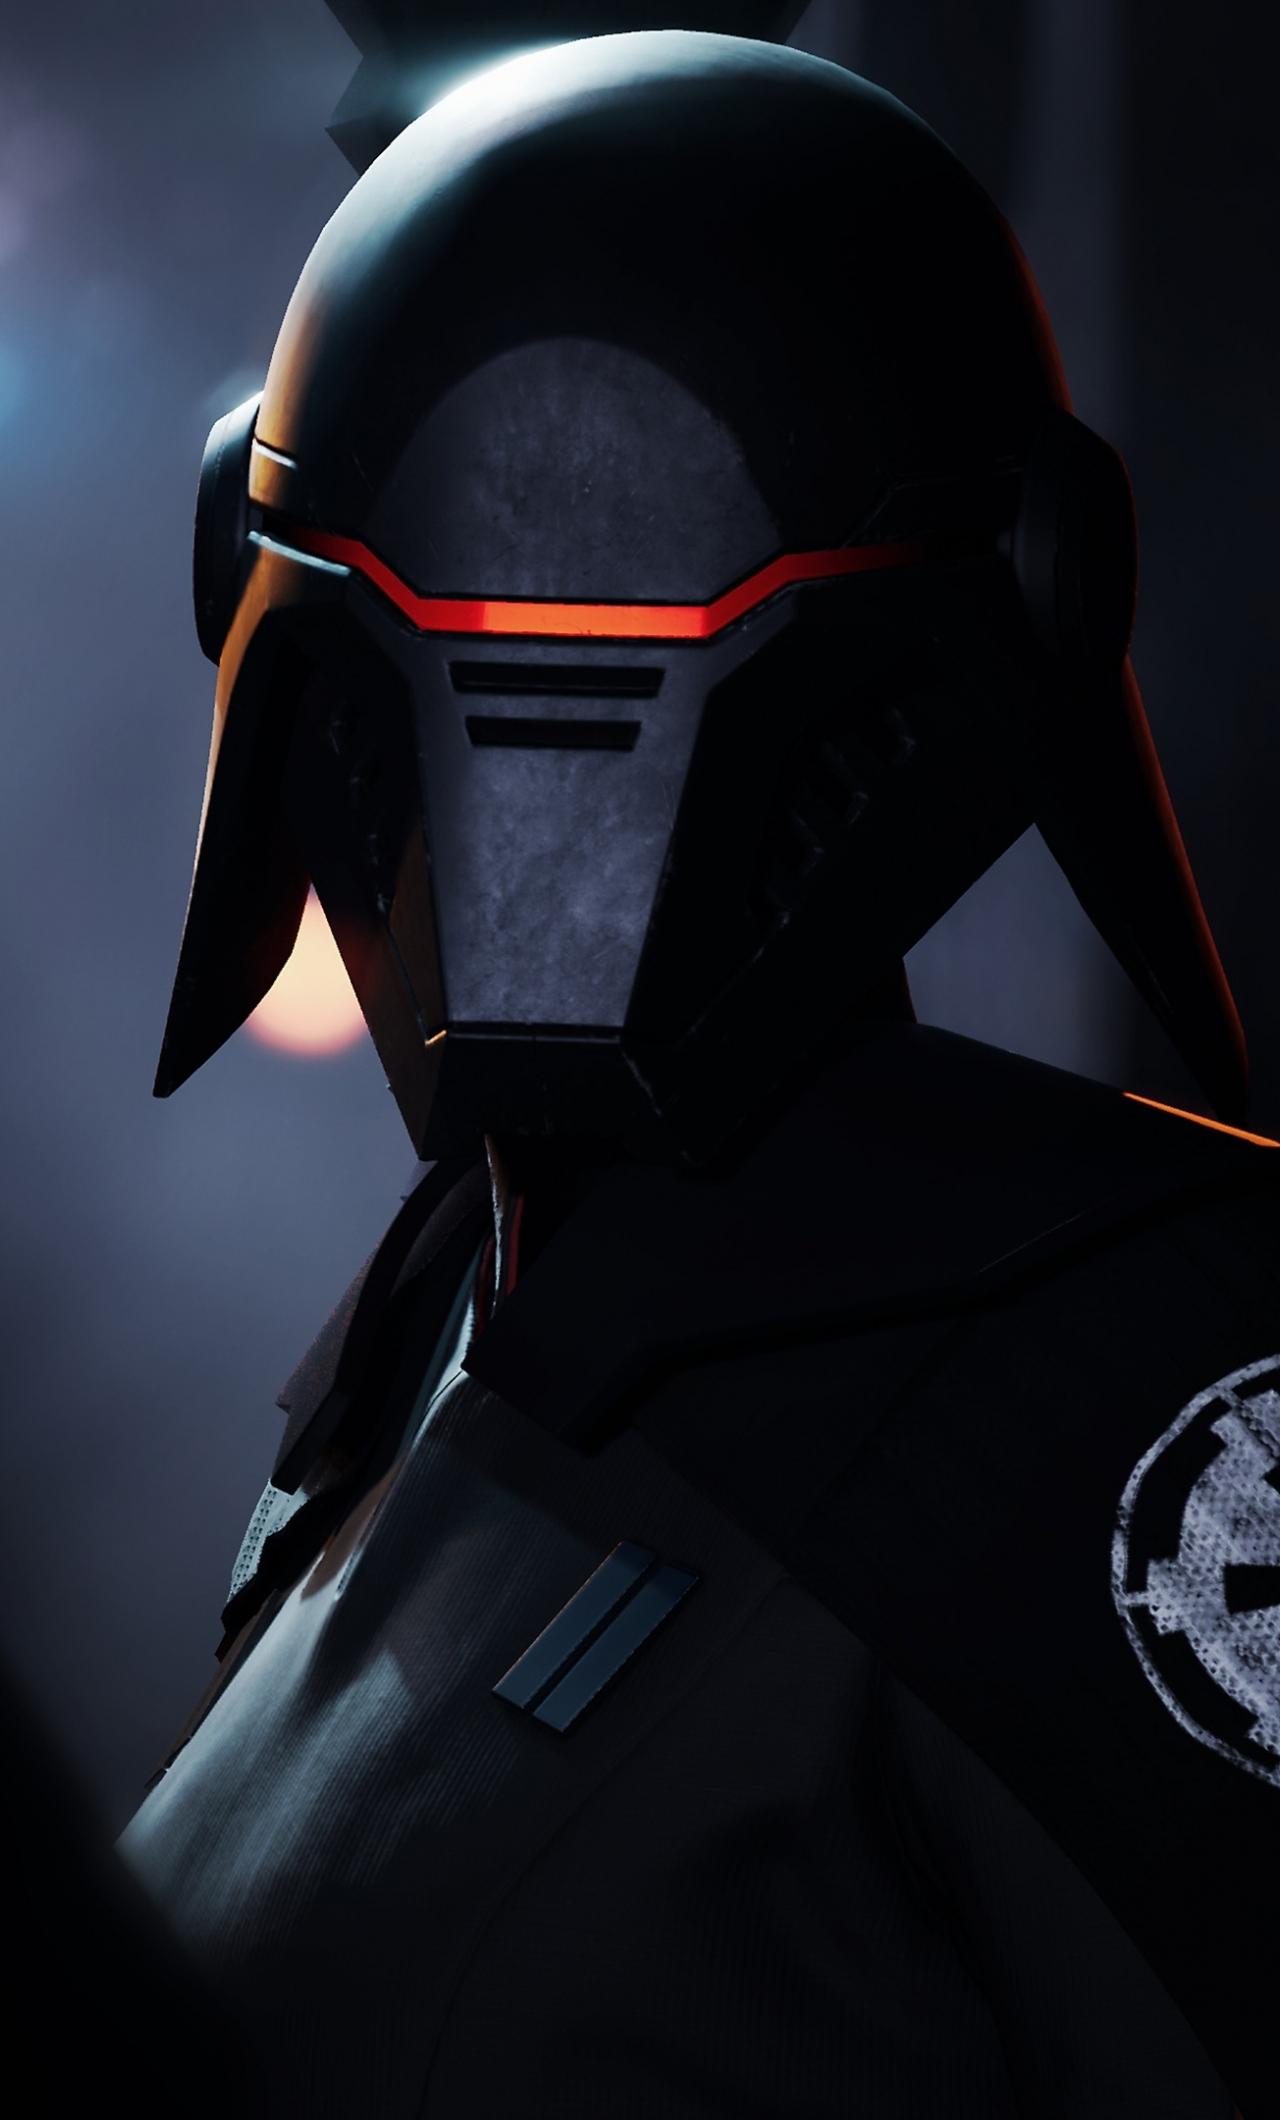 Download 1280x2120 Wallpaper Second Sister Star Wars Jedi Fallen